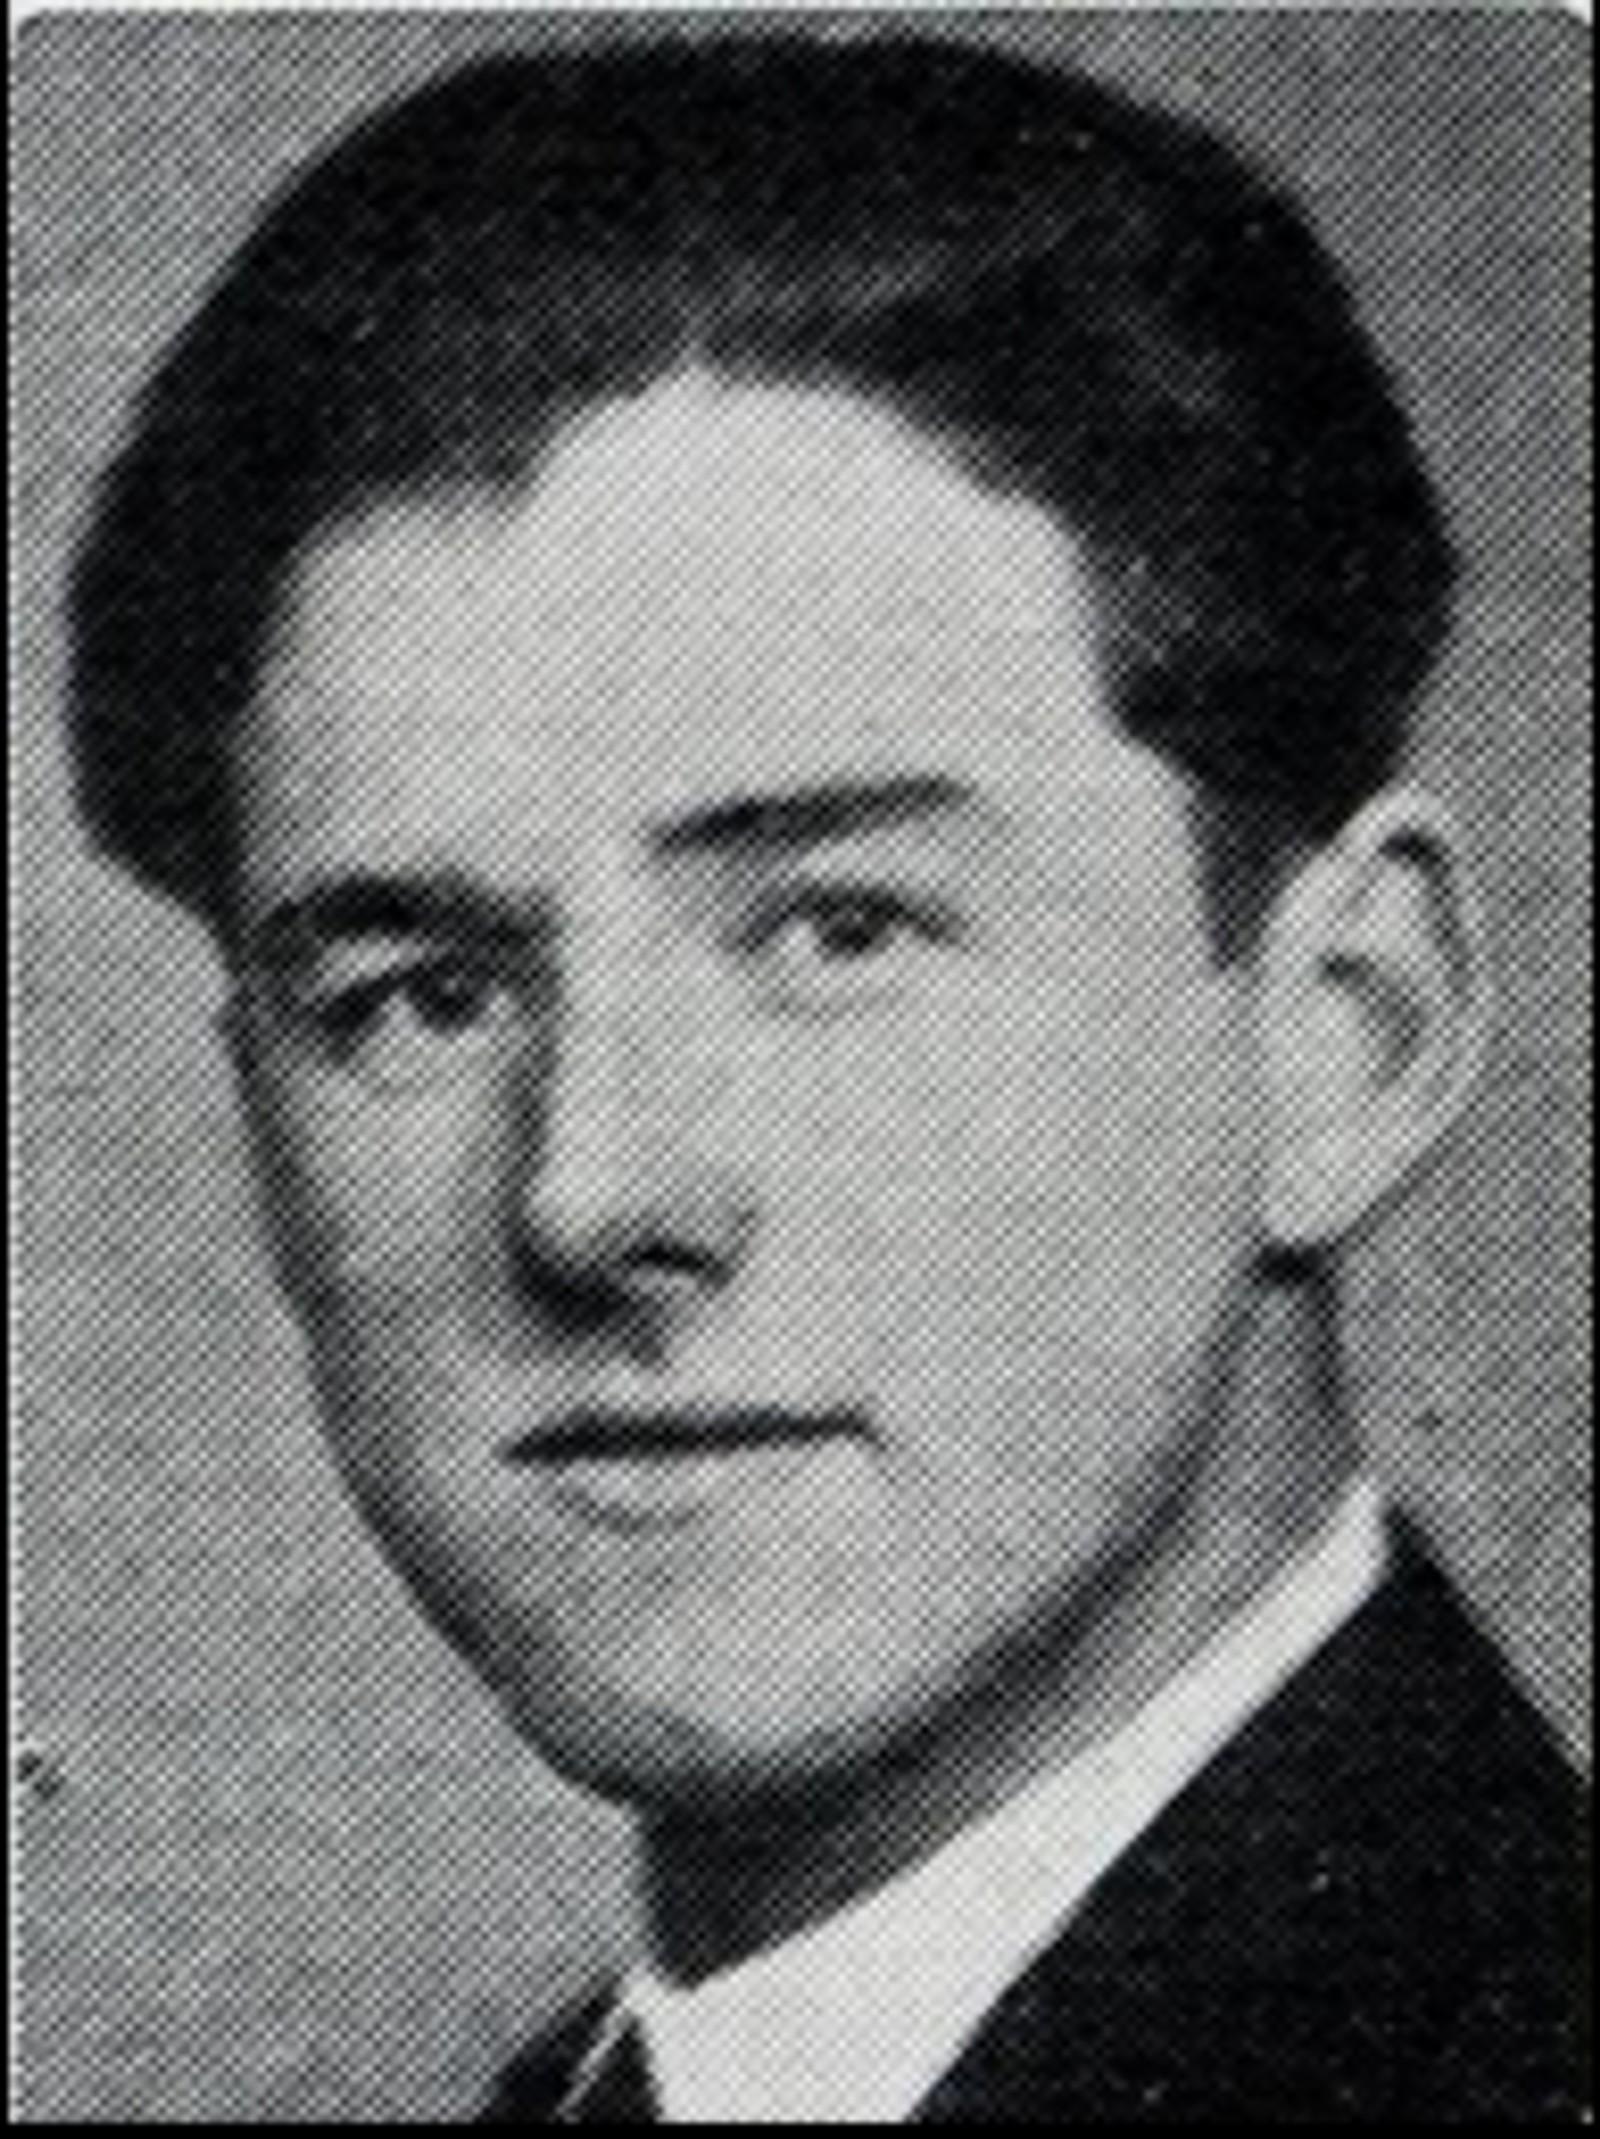 Arne Løvlund: Skoleelev, bodde på Skansen i Elverum. Døde på Glommen Bruk under bombeangrepet 11.april.